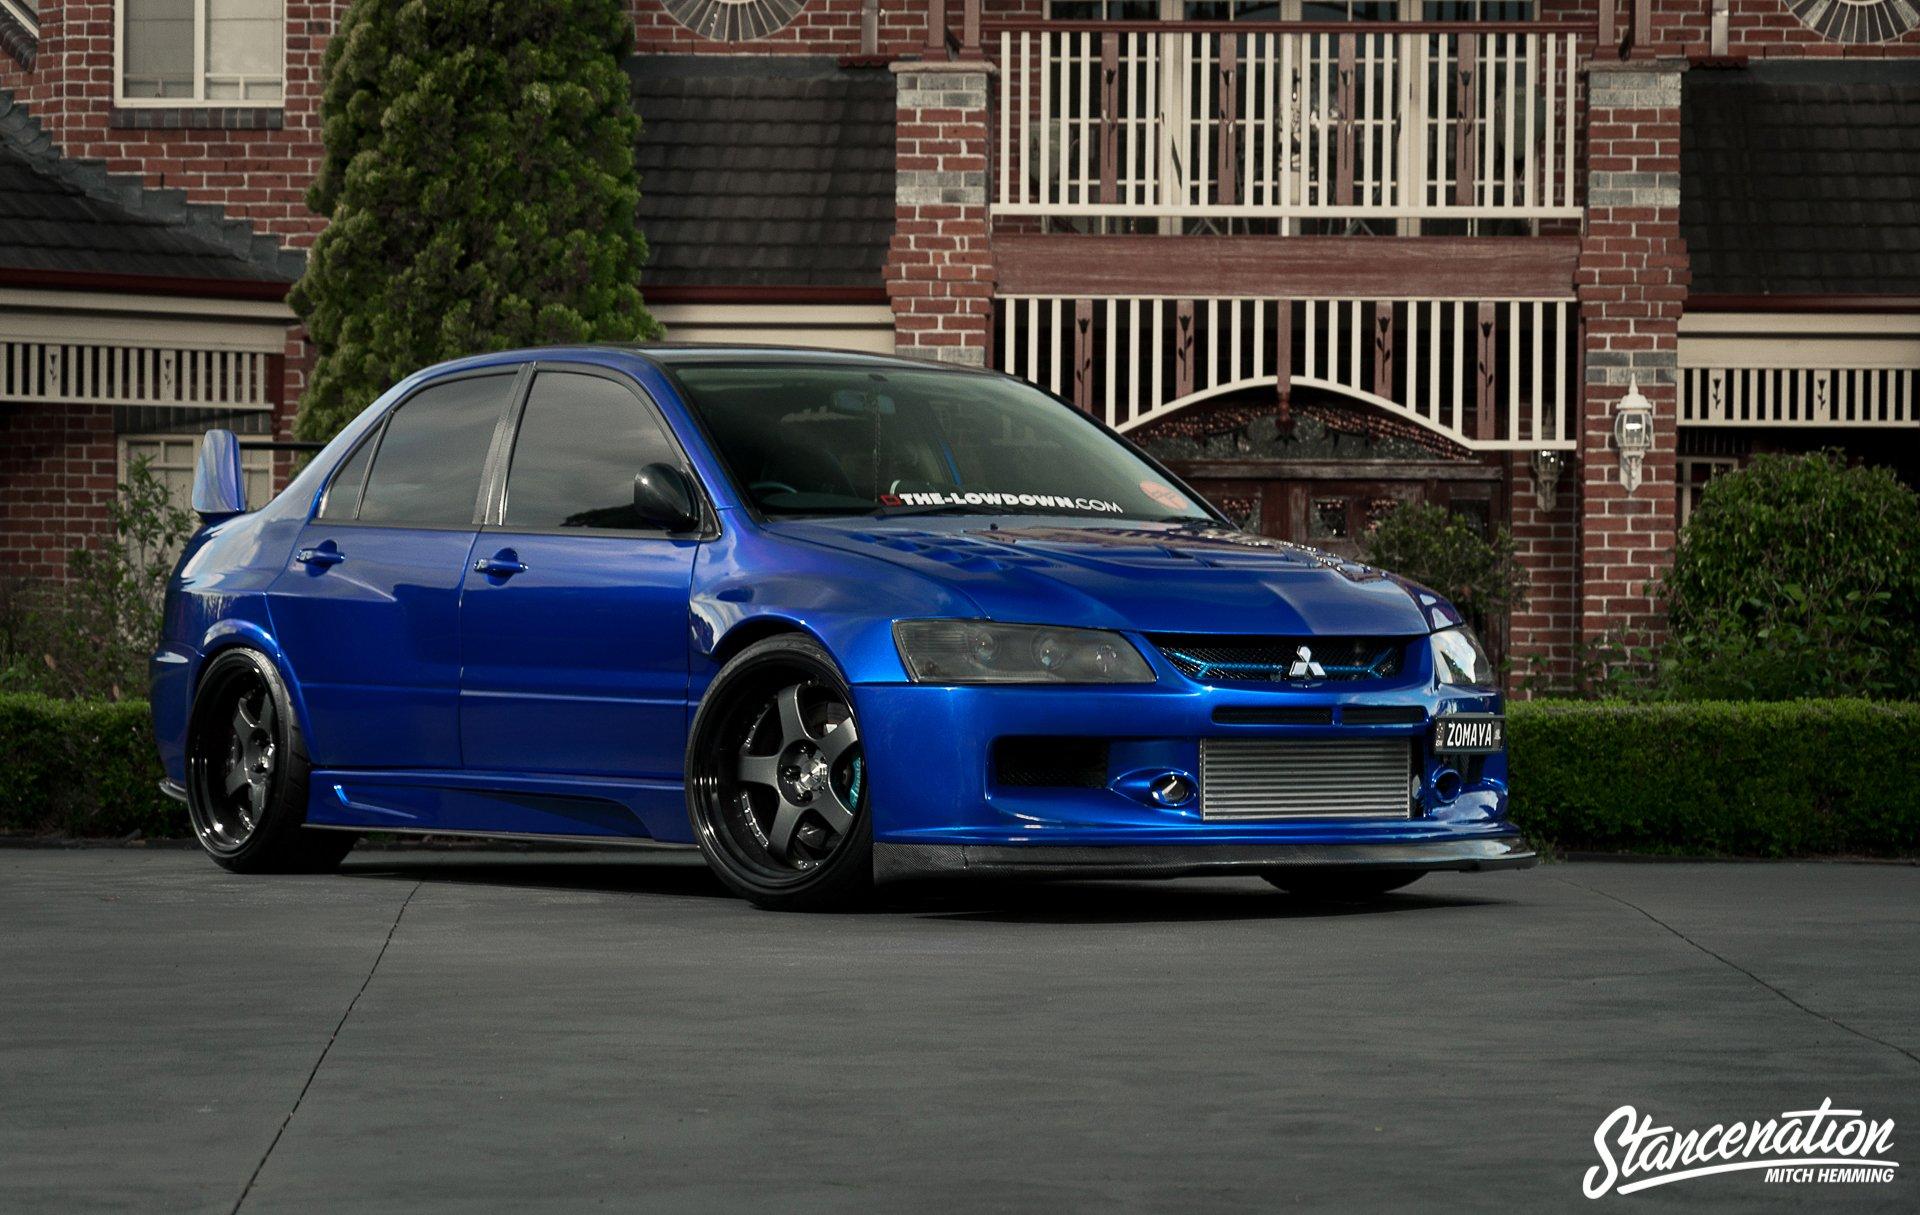 mitsubishi lancer evo ix blue cars sedan modified wallpaper 1920x1215 812915 wallpaperup. Black Bedroom Furniture Sets. Home Design Ideas